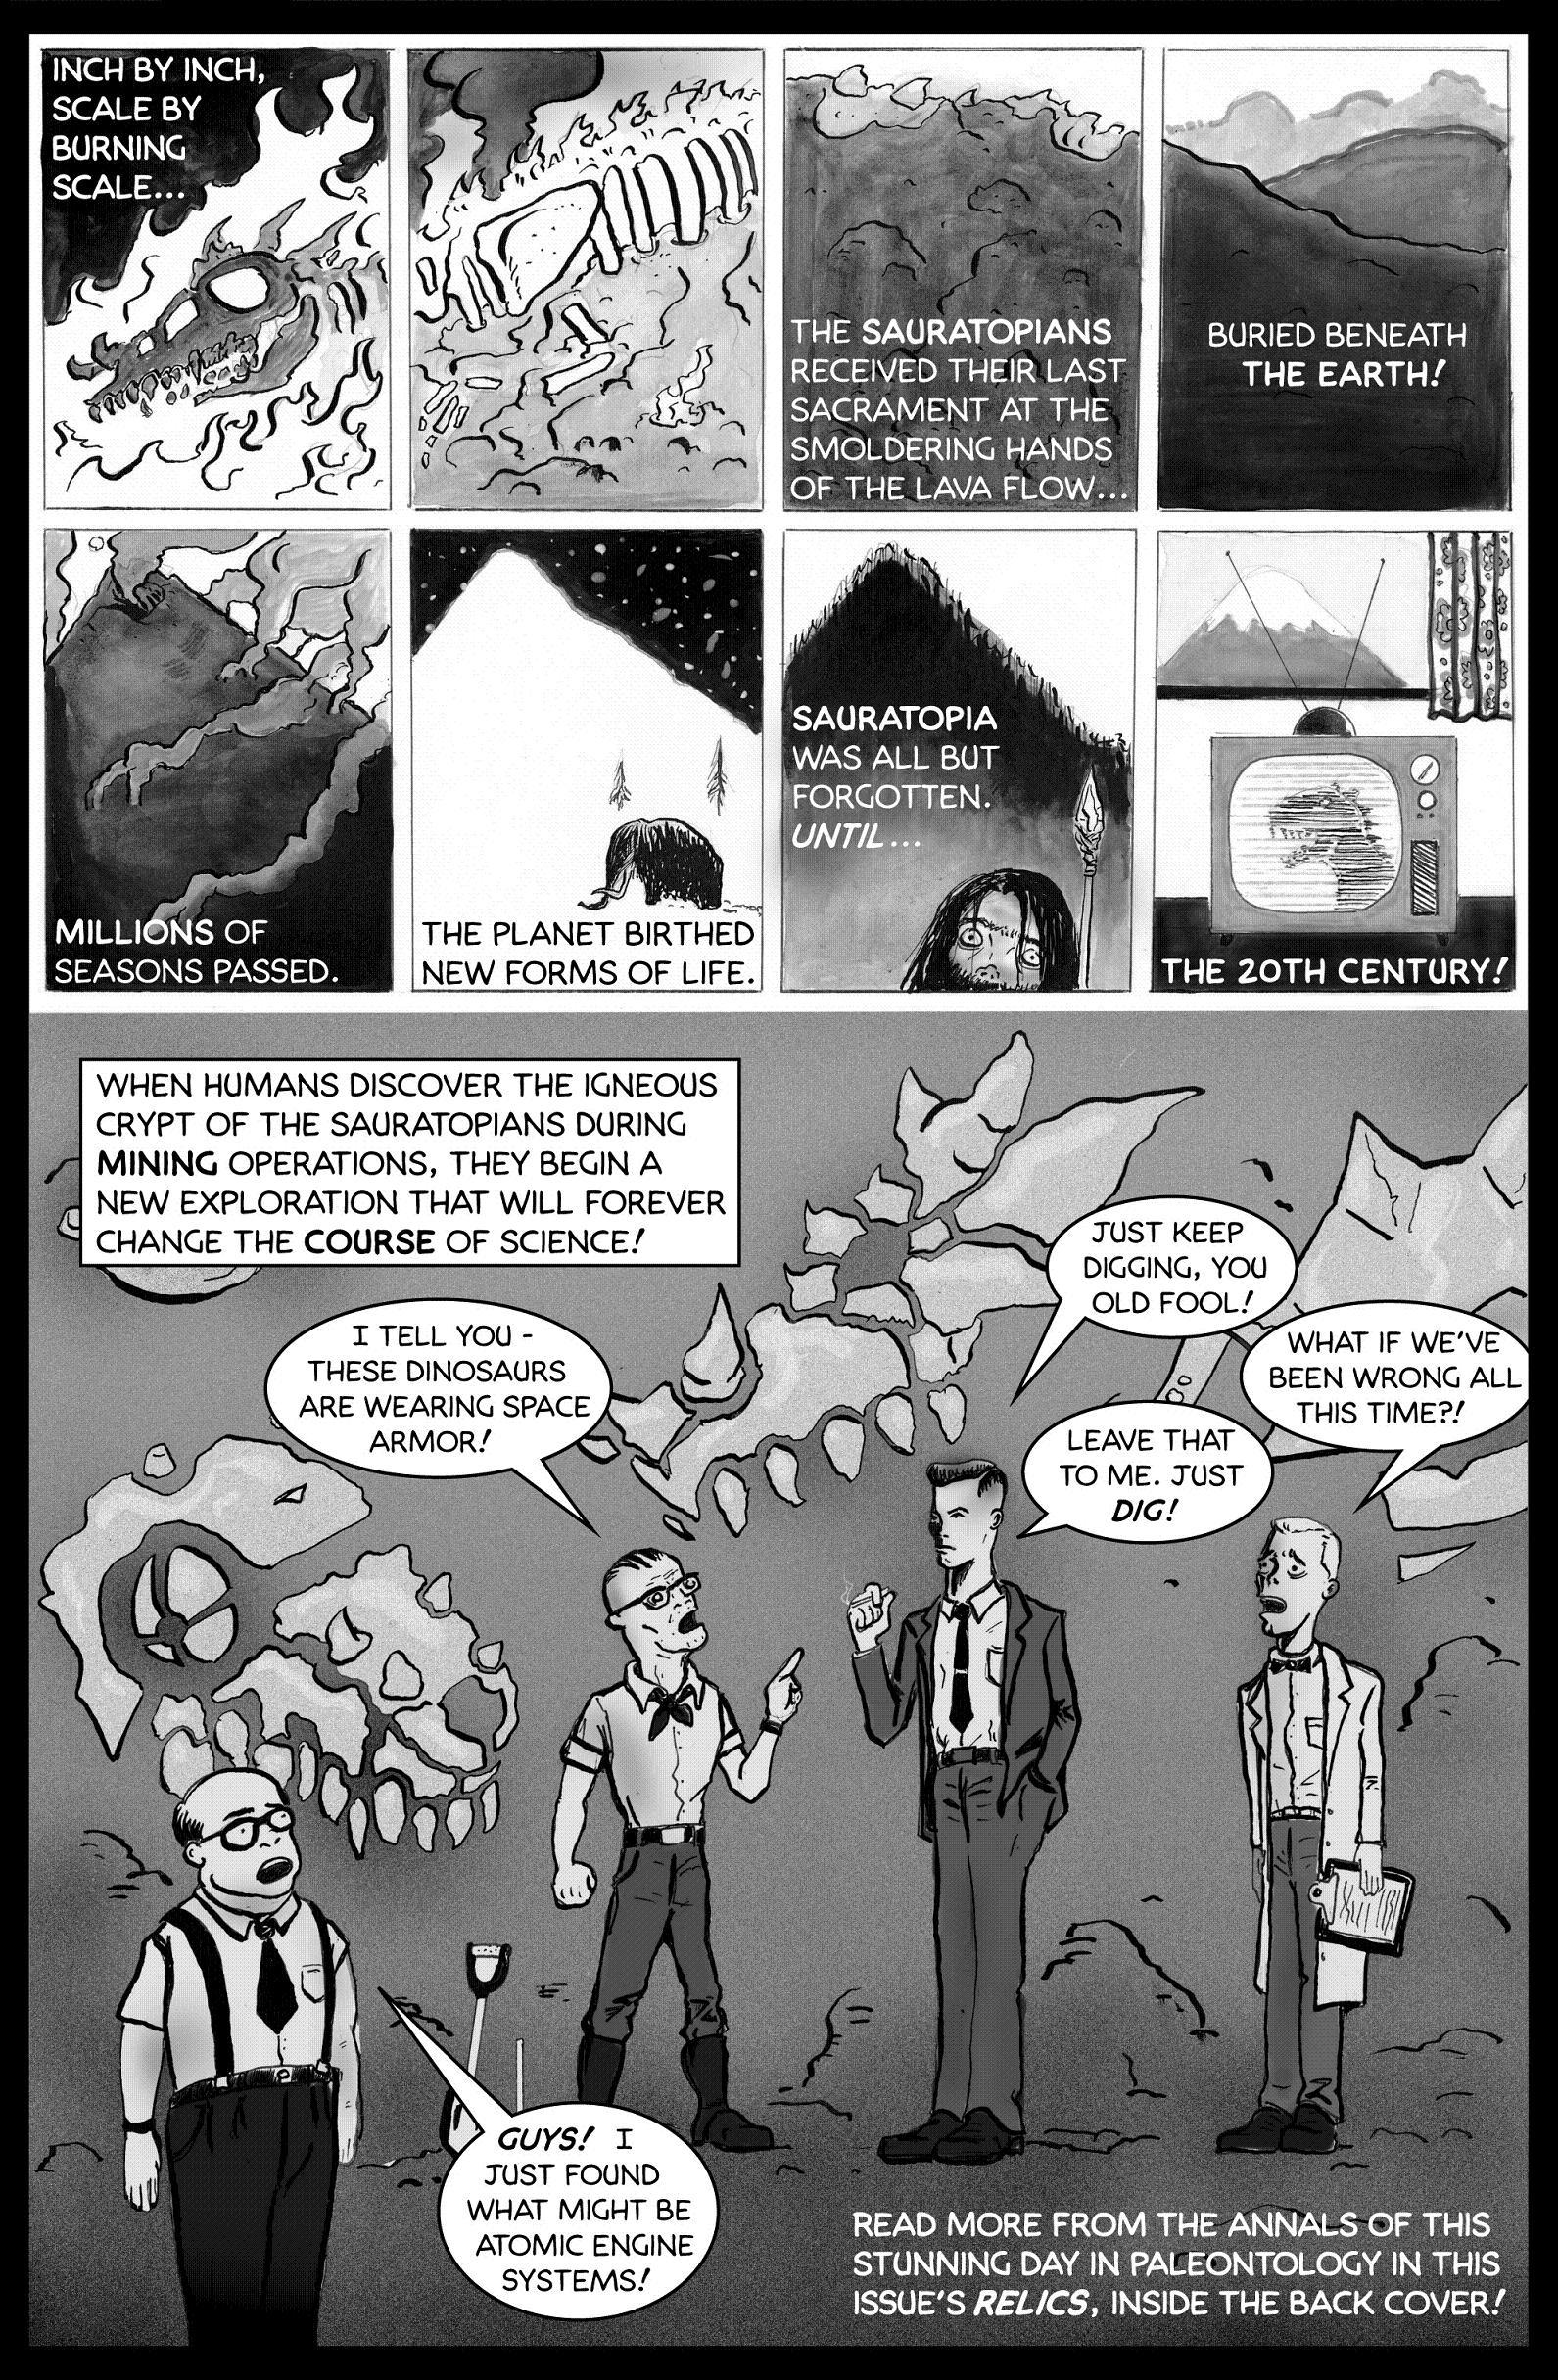 7 Sauratopia pg 6